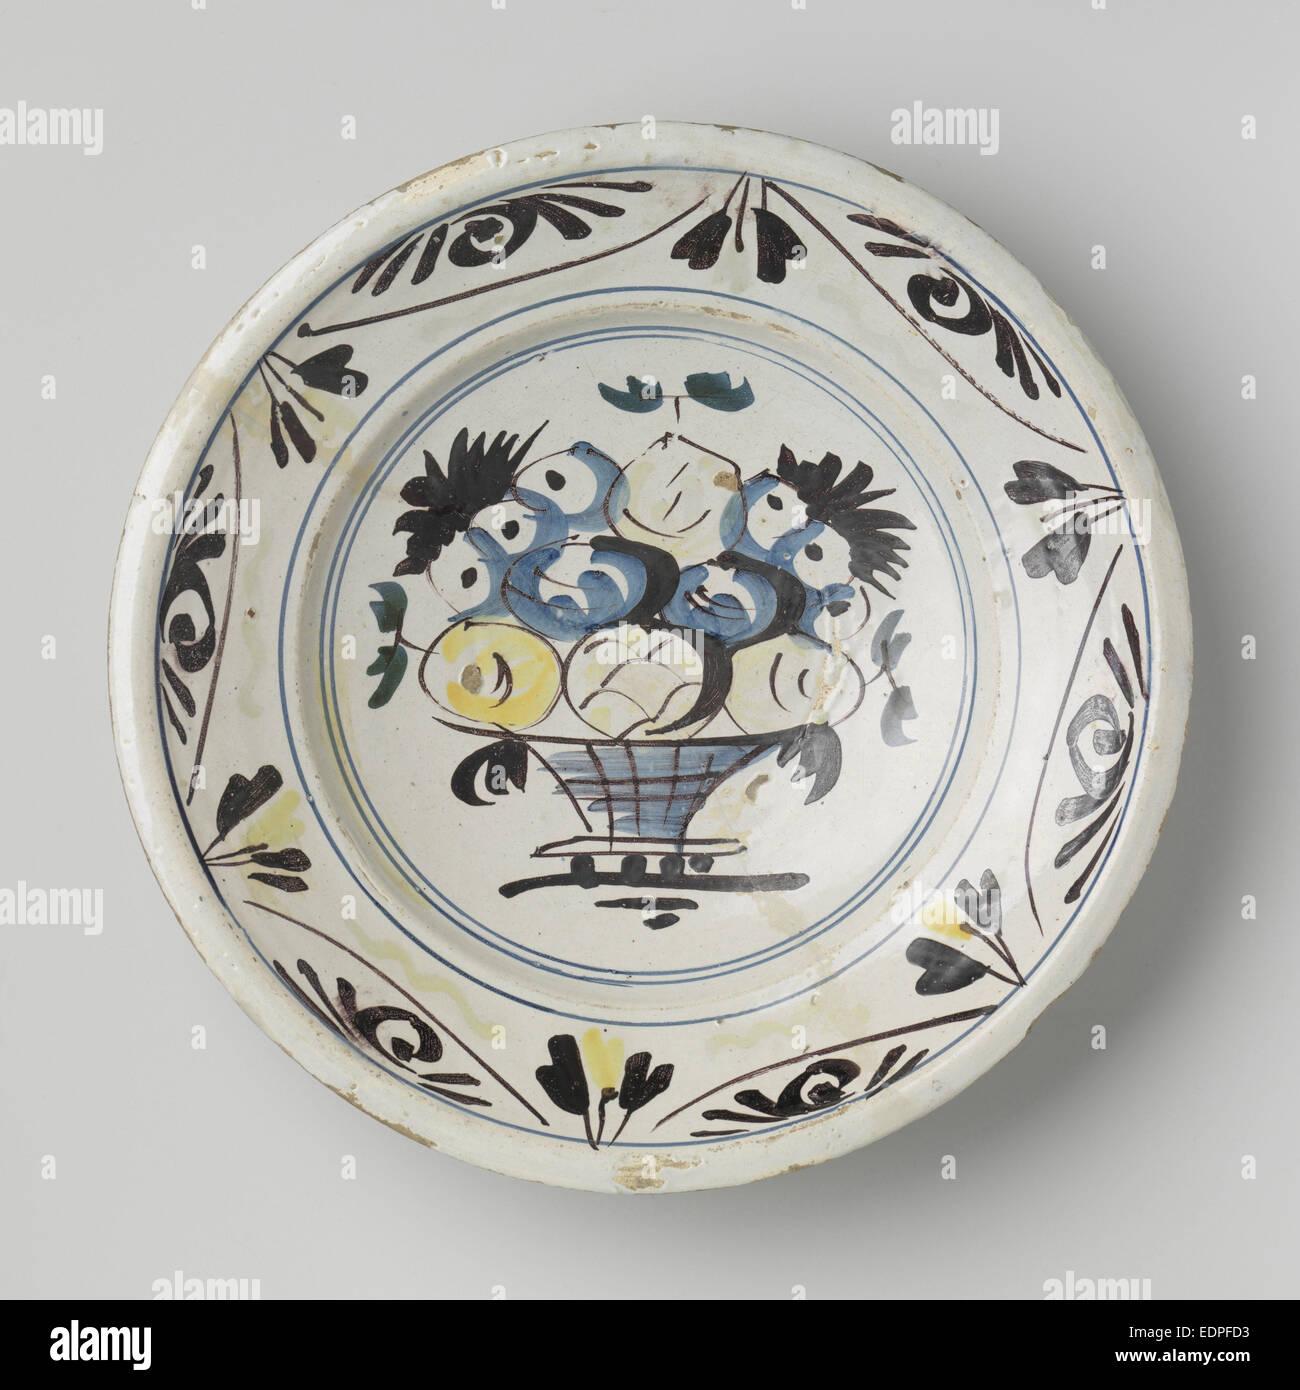 Dish polychrome painted majolica, Anonymous, c. 1725 - c. 1775 - Stock Image